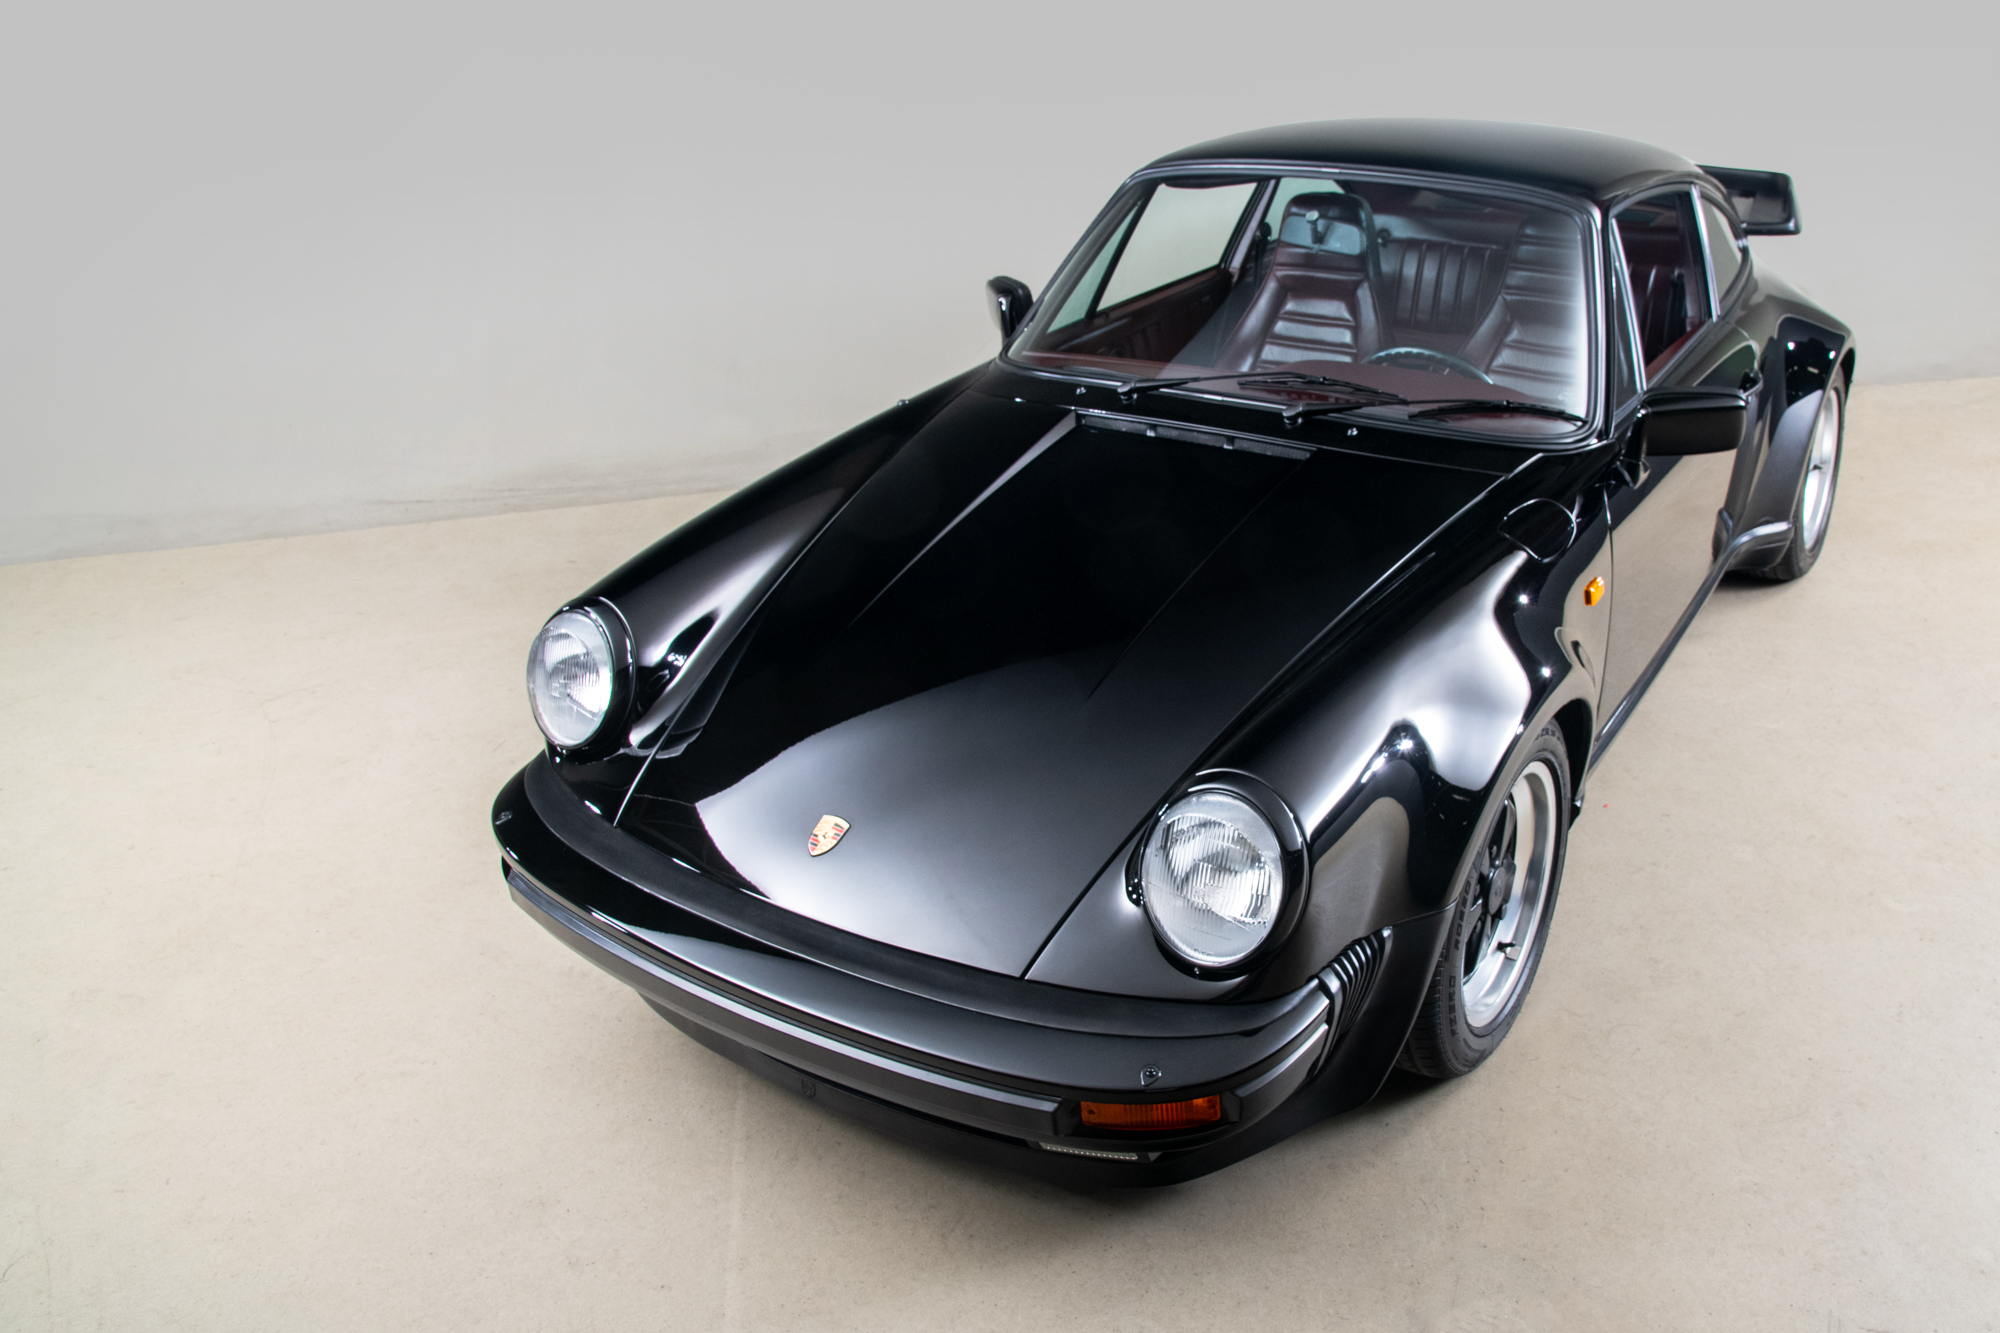 1984 Porsche 930 Turbo , BLACK, VIN WP0ZZZ93ZES000496, MILEAGE 4290